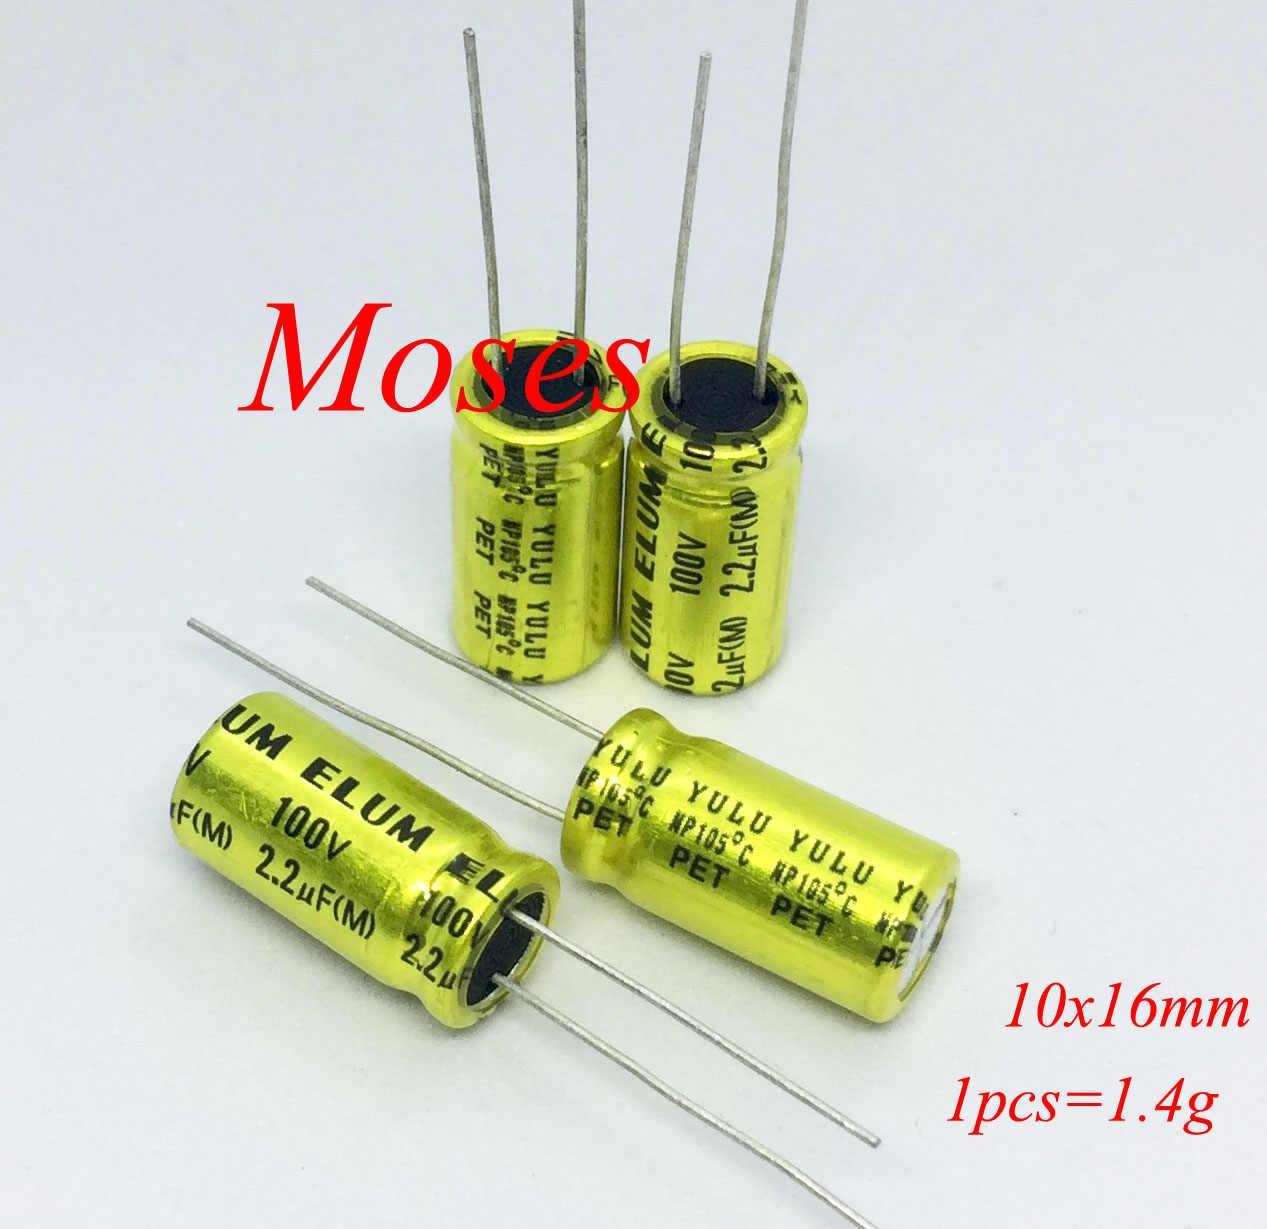 100V 2.2uF Electrolytic Radial Capacitors 105°C ±20/%  5mm x 11mm